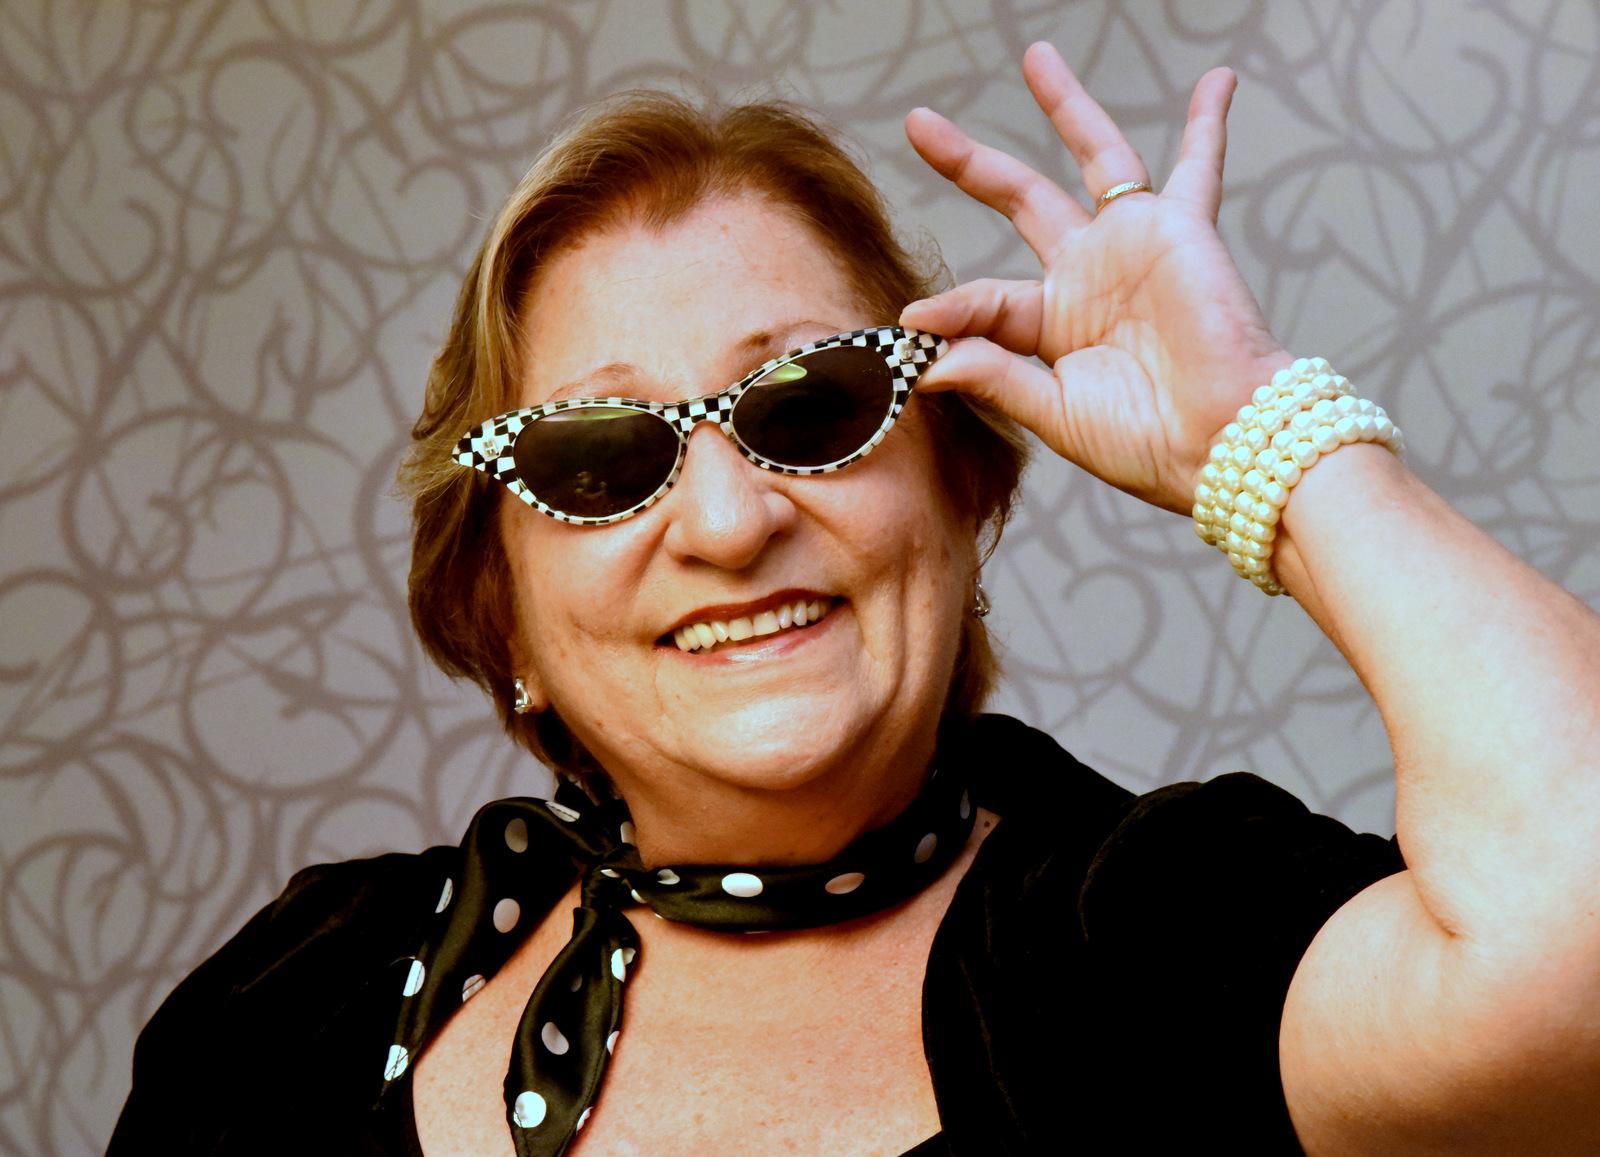 Miriam Barletta